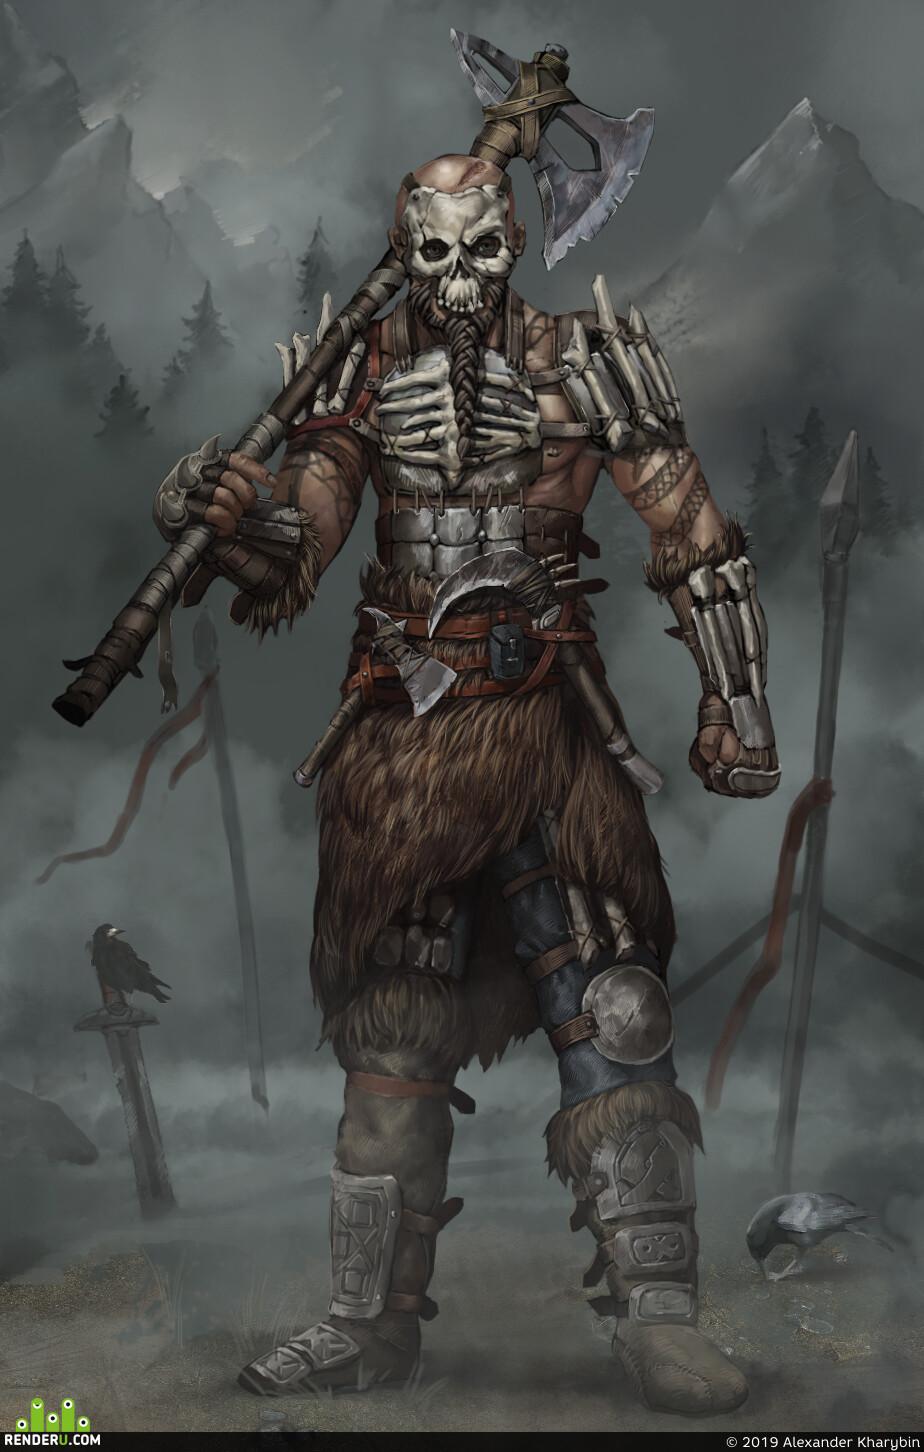 викинги, берсерк, Персонажи